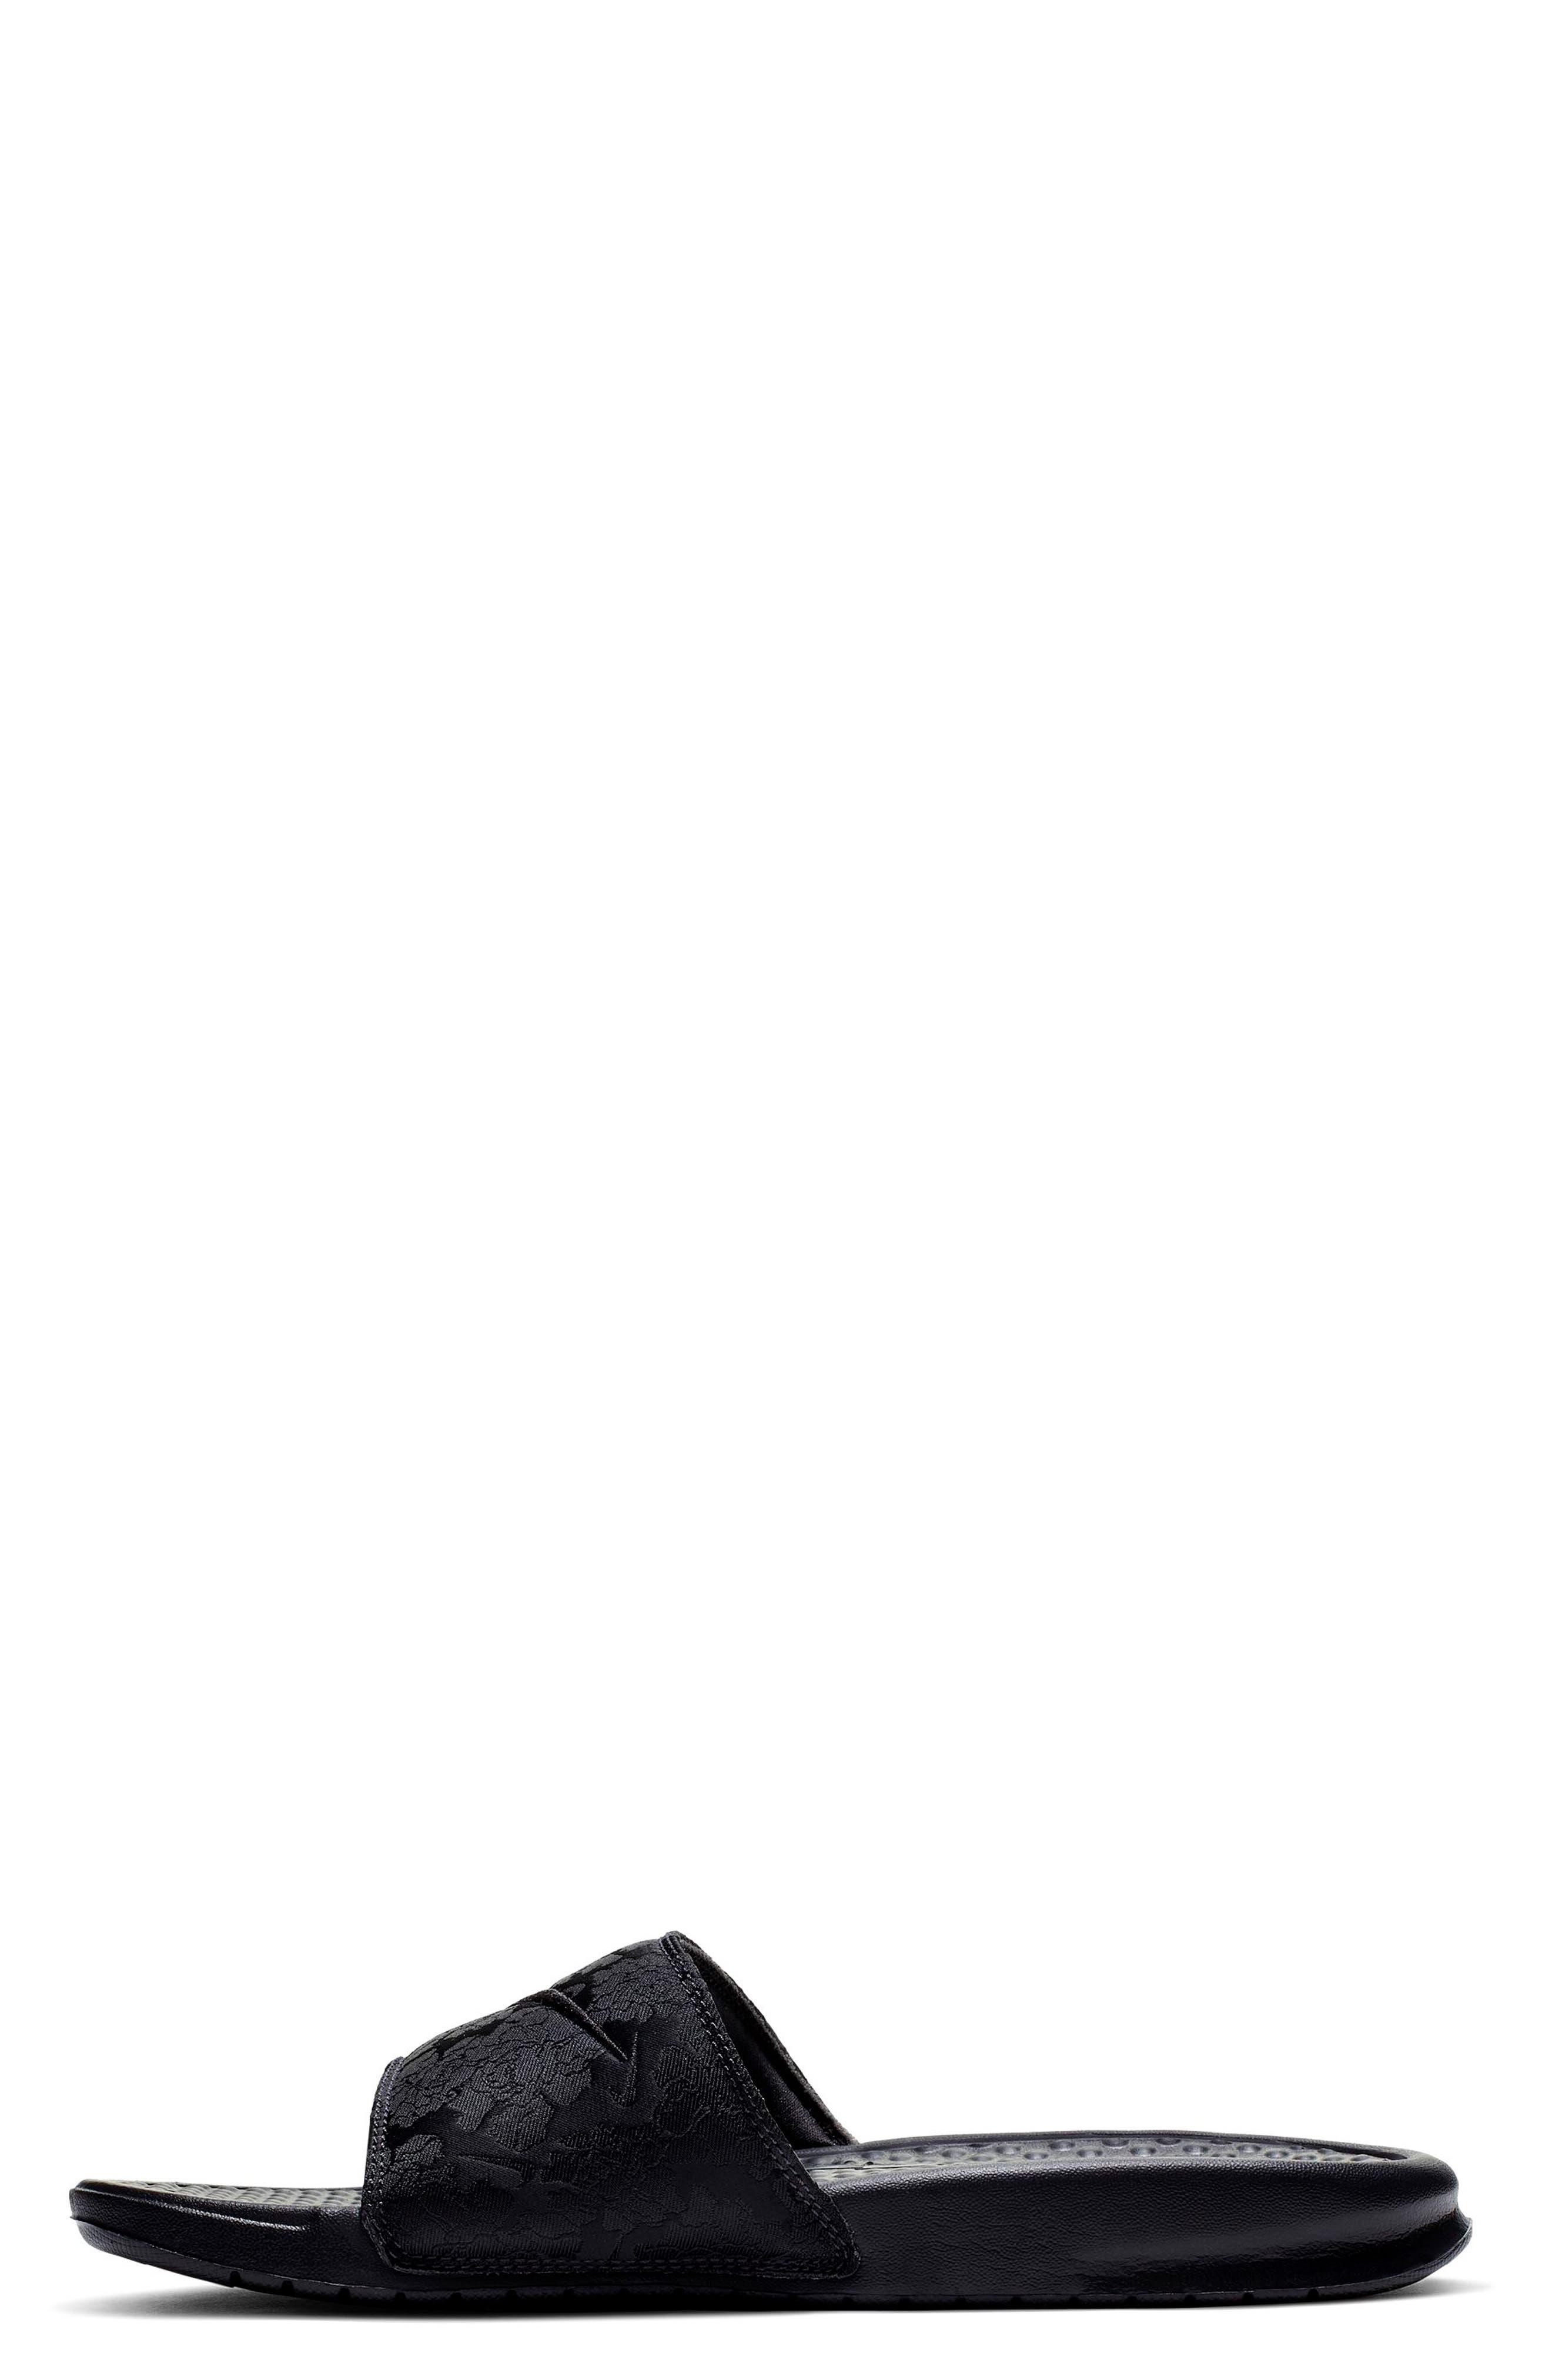 ,                             Benassi JDI Textile SE Slide Sandal,                             Alternate thumbnail 2, color,                             BLACK/ BLACK/ OIL GREY